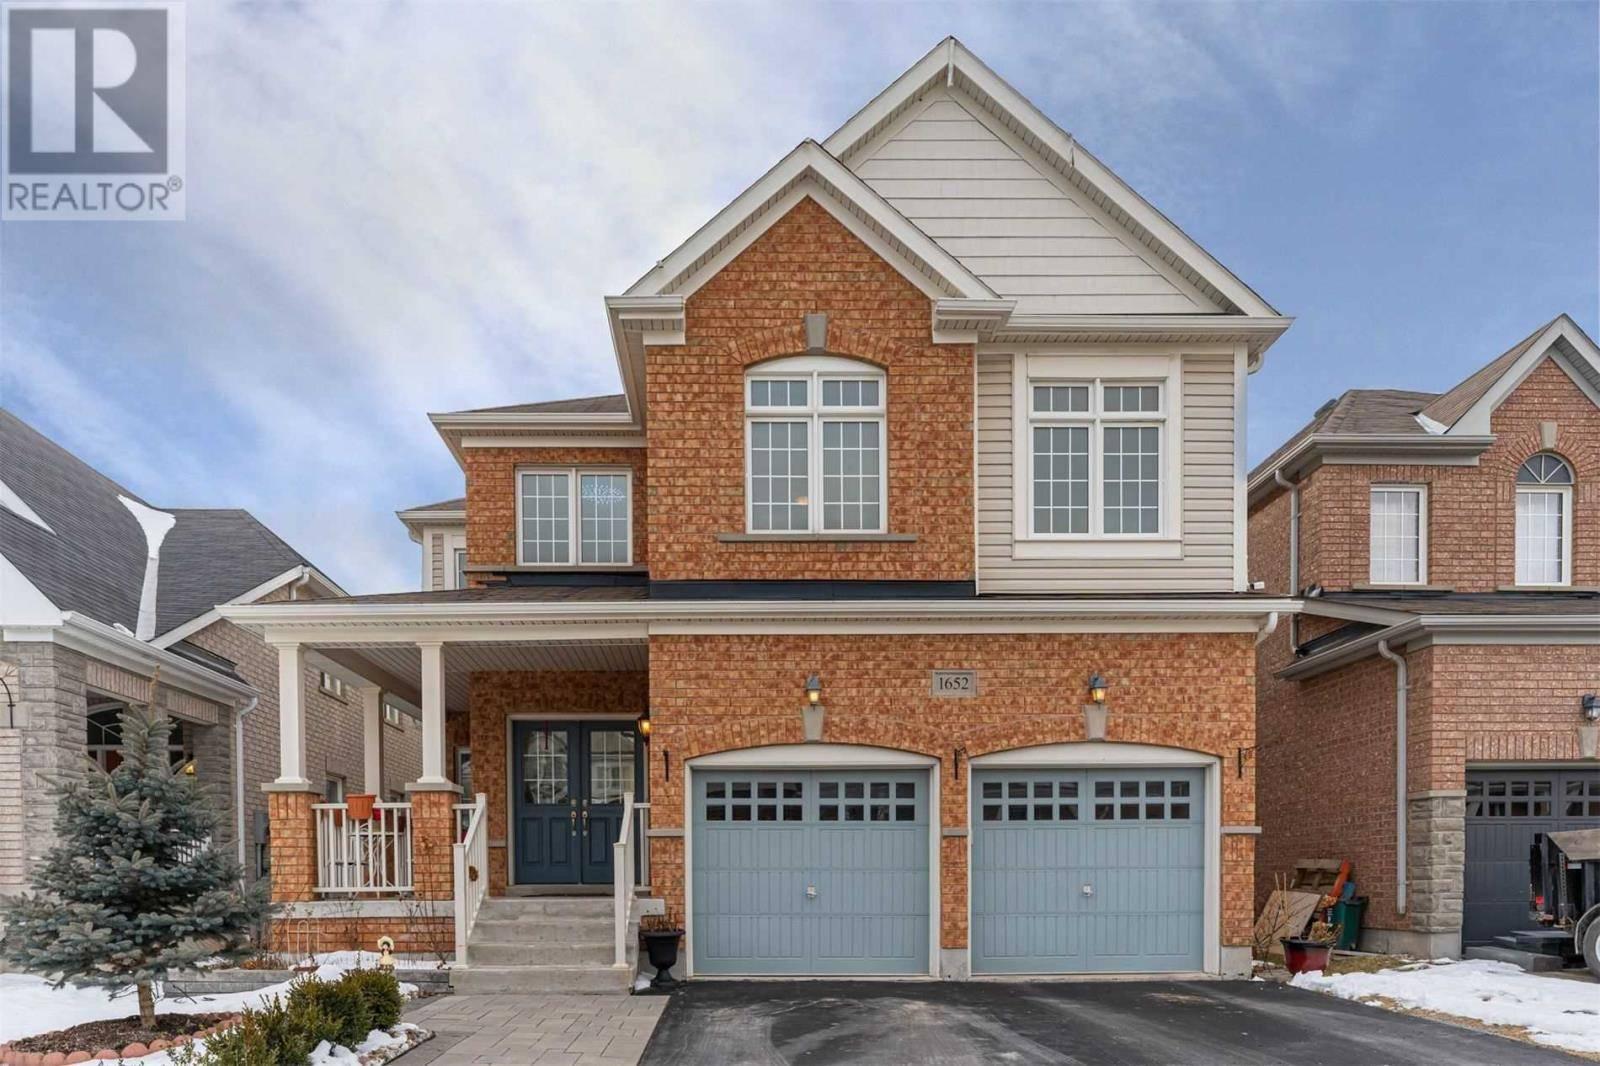 House for sale at 1652 Frolis St Oshawa Ontario - MLS: E4681332